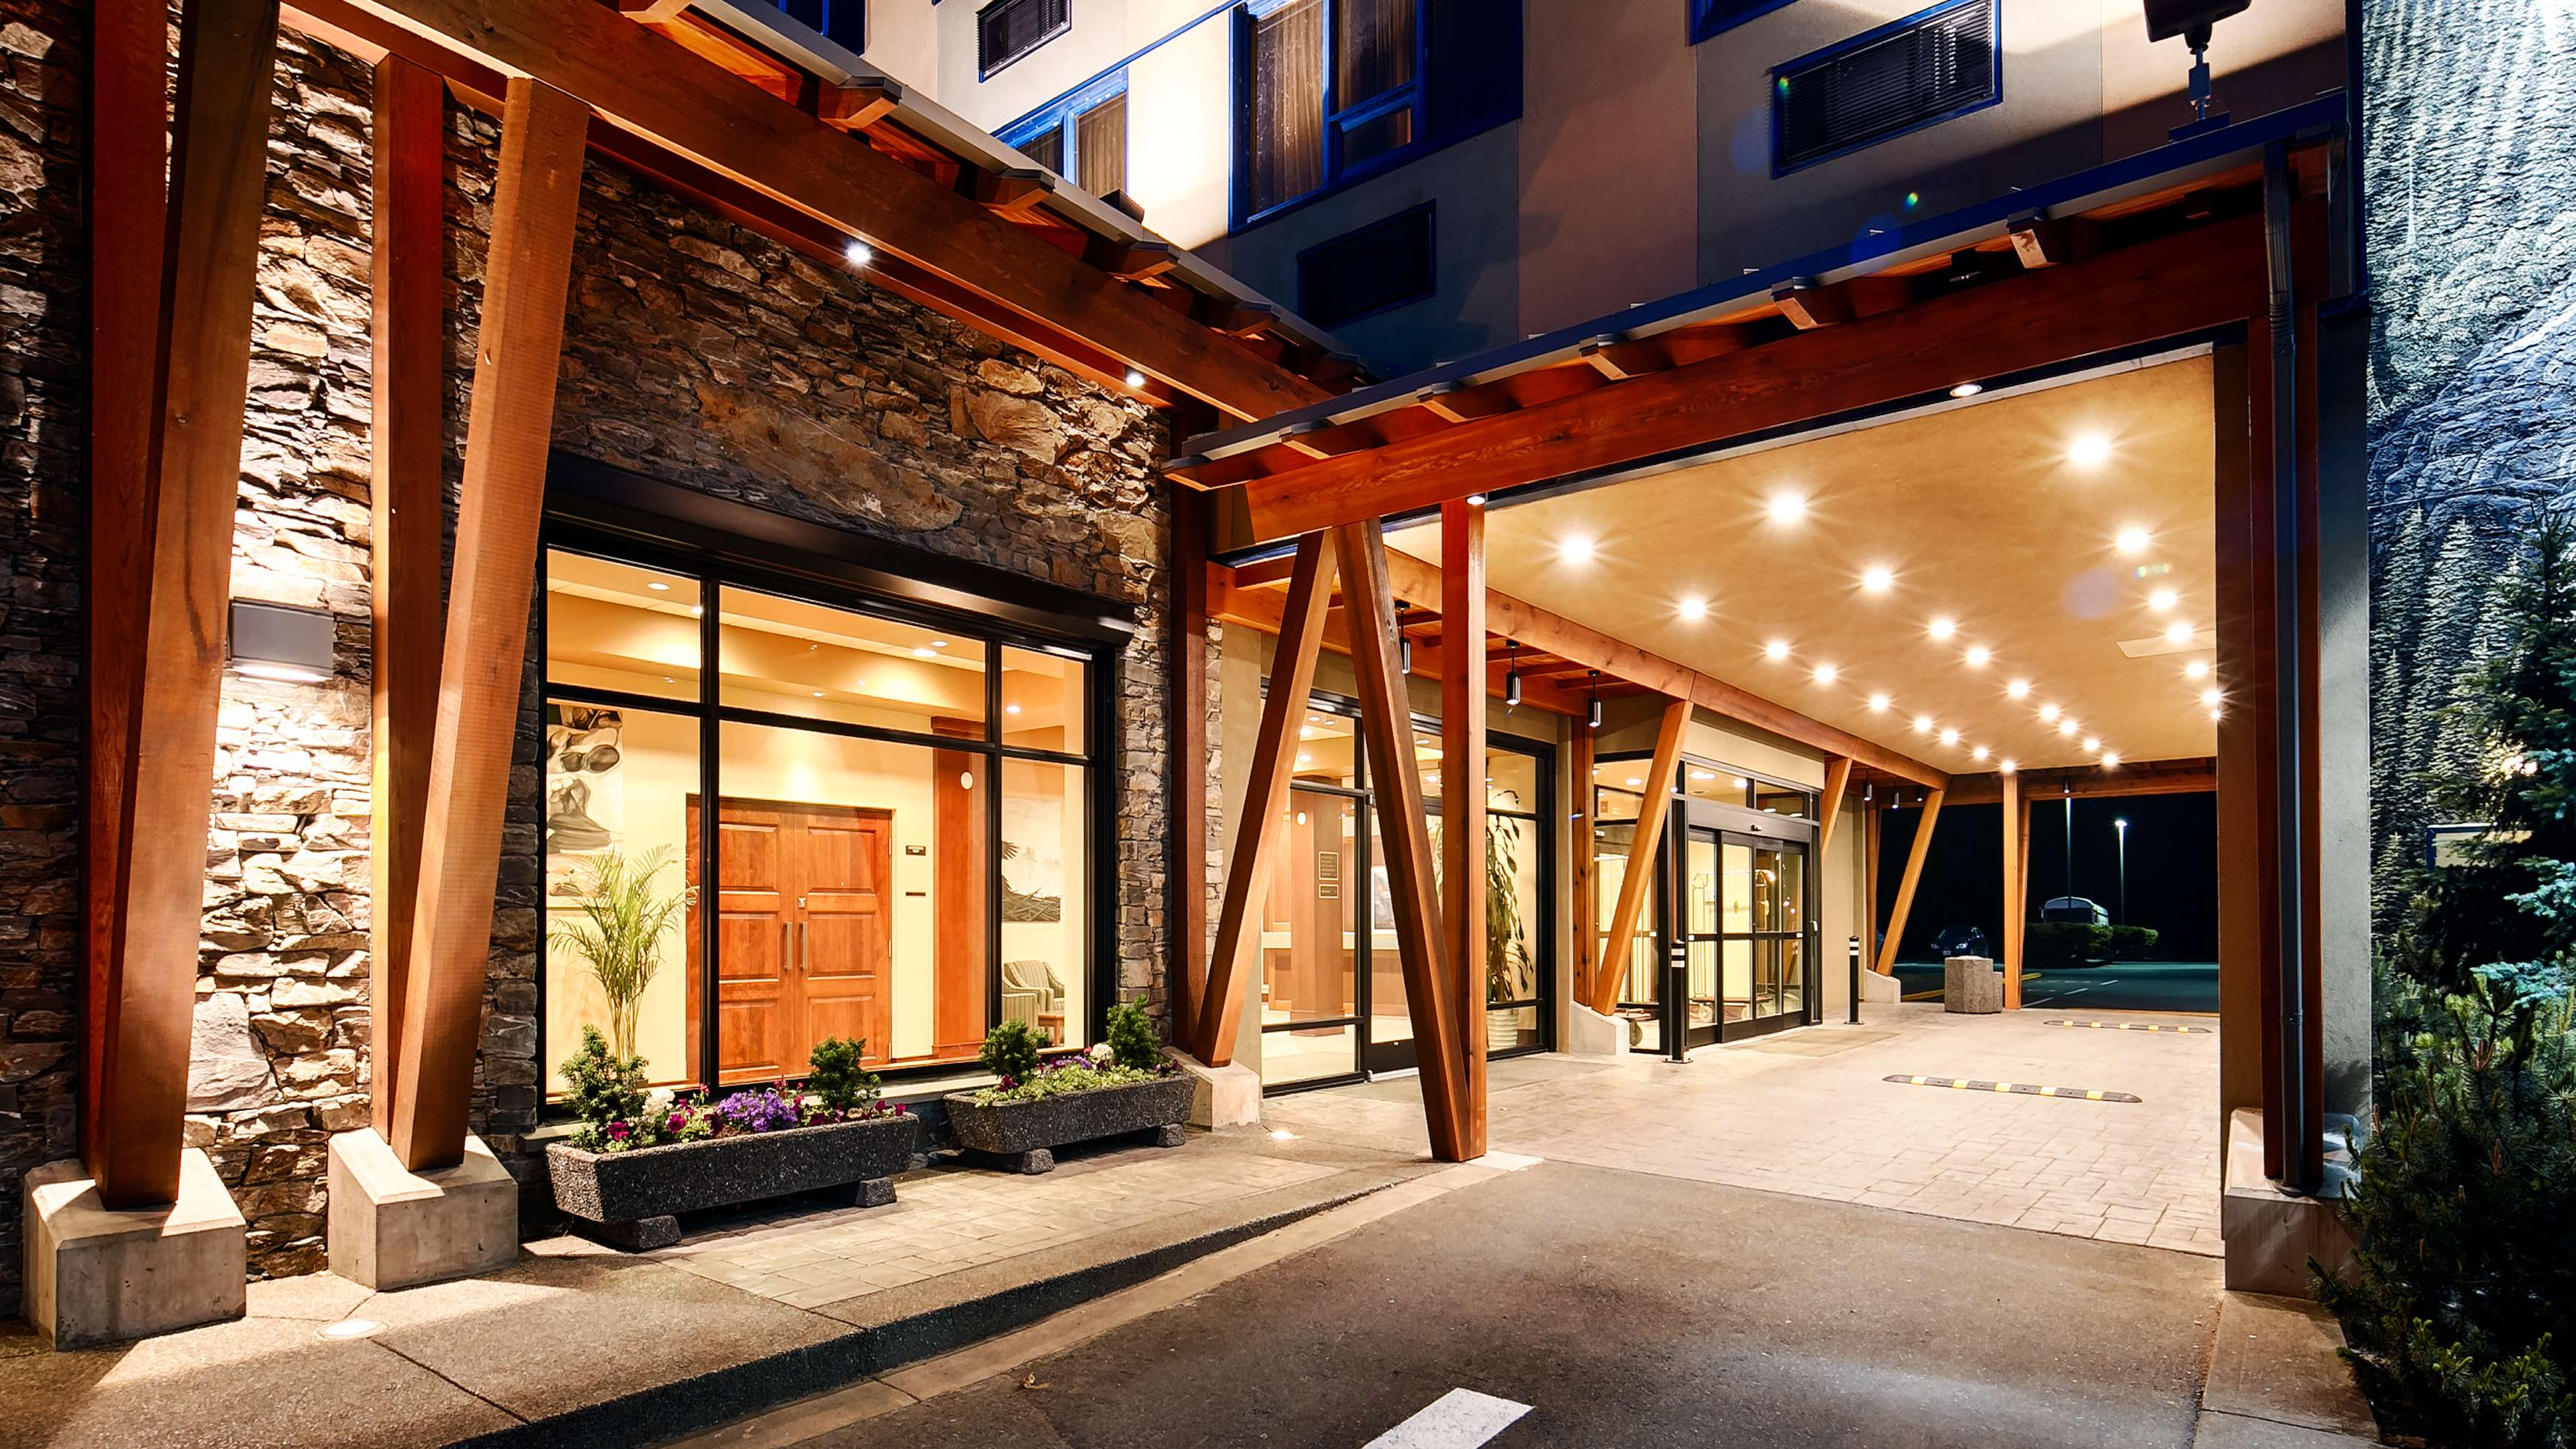 Best Western Plus Barclay Hotel in Port Alberni: Exterior